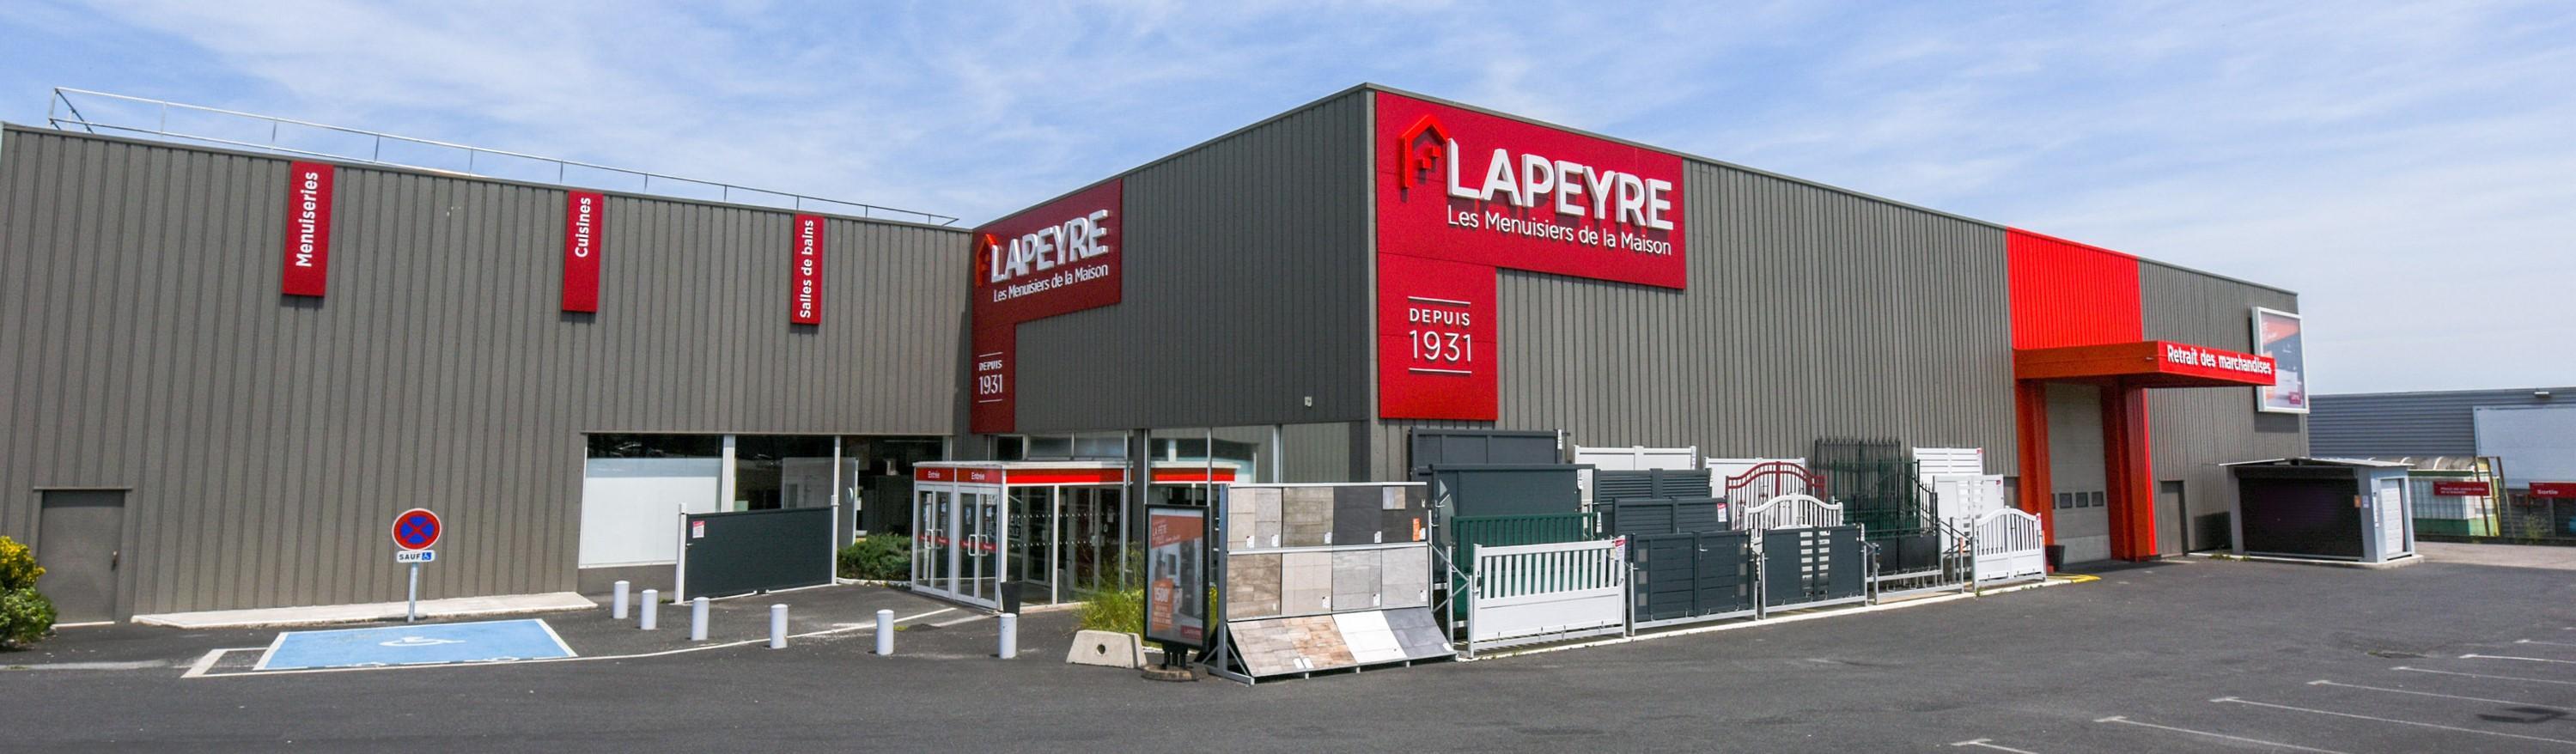 Lapeyre Brive La Gaillarde